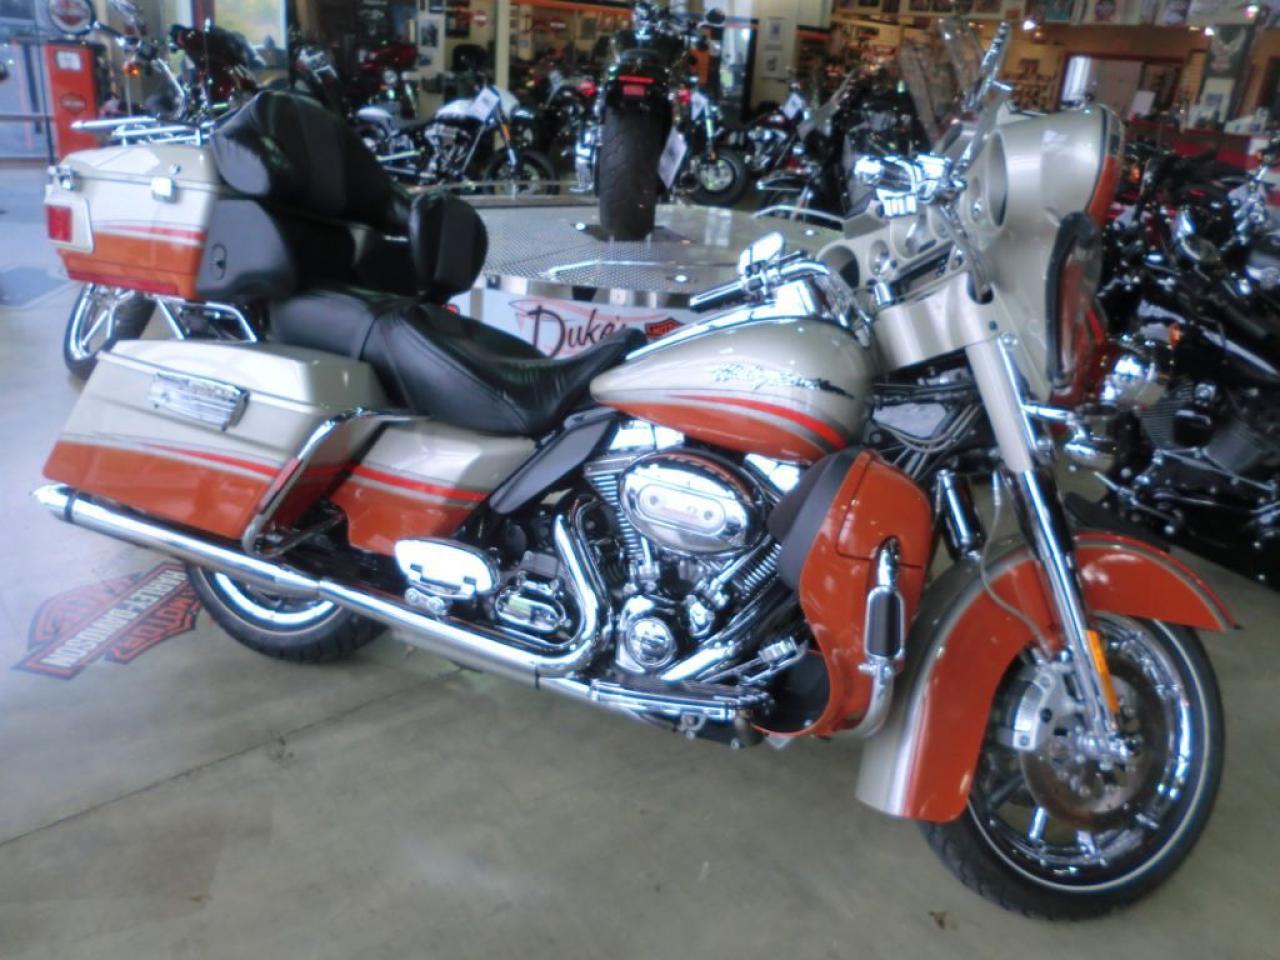 2009 Harley-Davidson ULTRA CLASSIC CVO SCREAMIN' EAGLE ELECTRA GLIDE